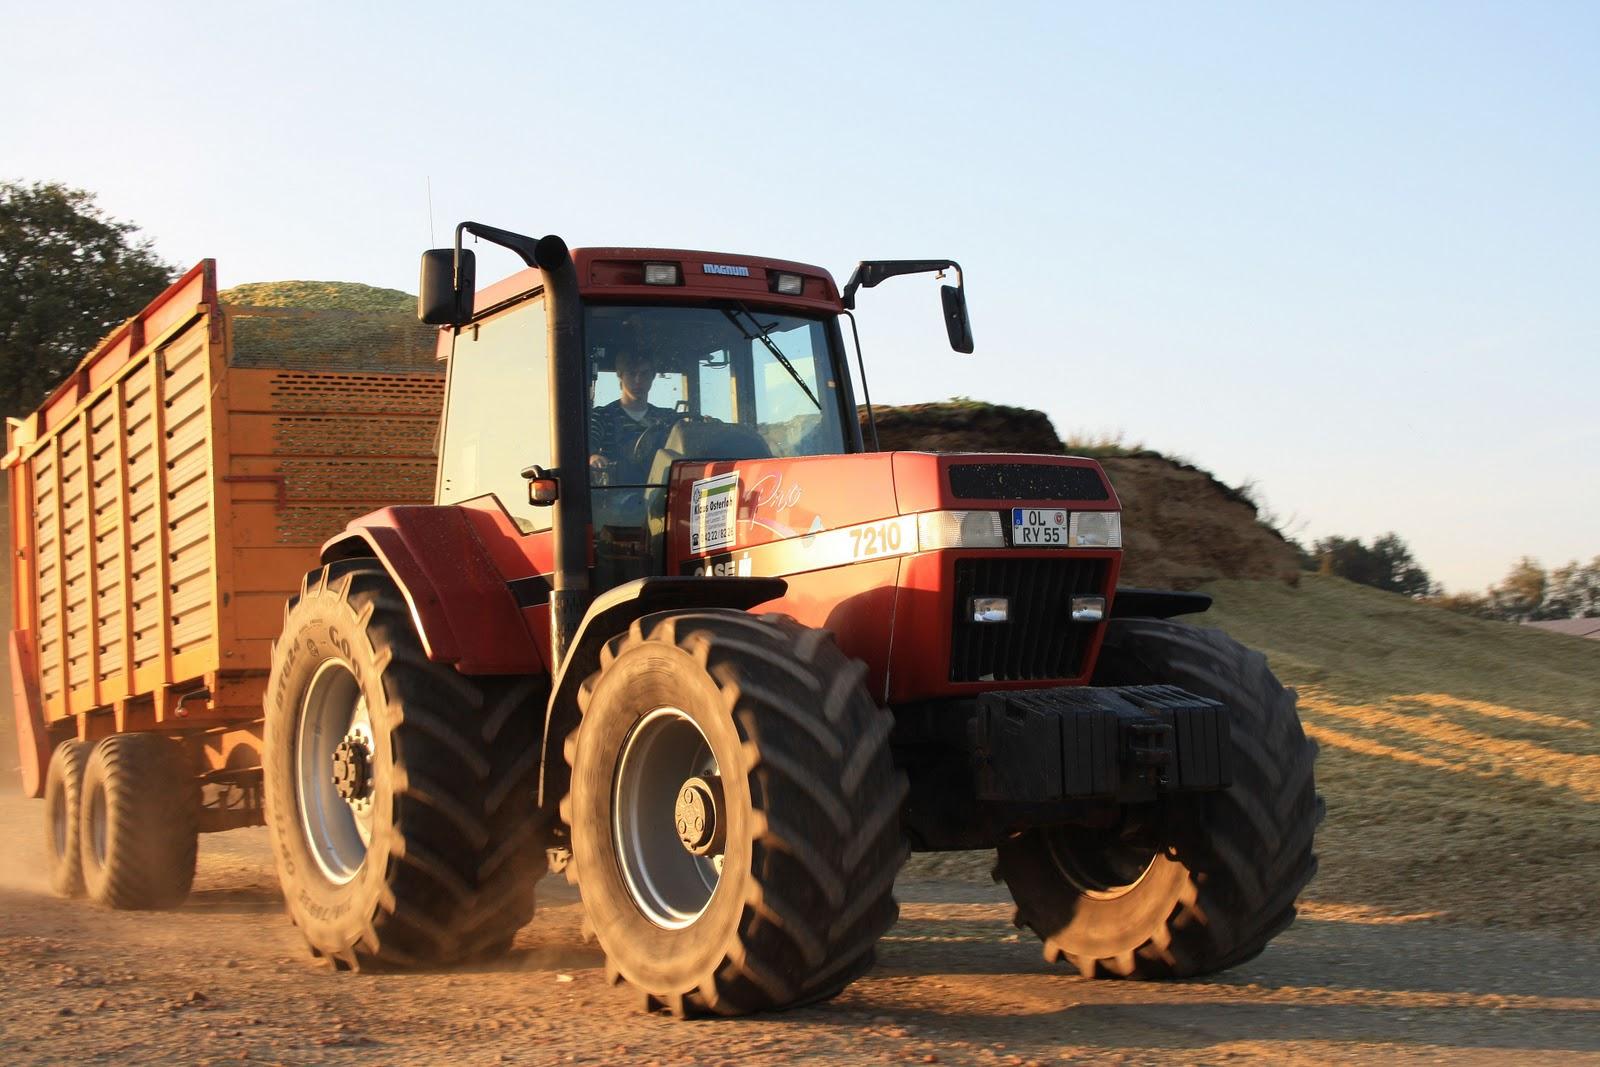 Agrar fotografie das rote silo case ih traktoren im for Fotografie case